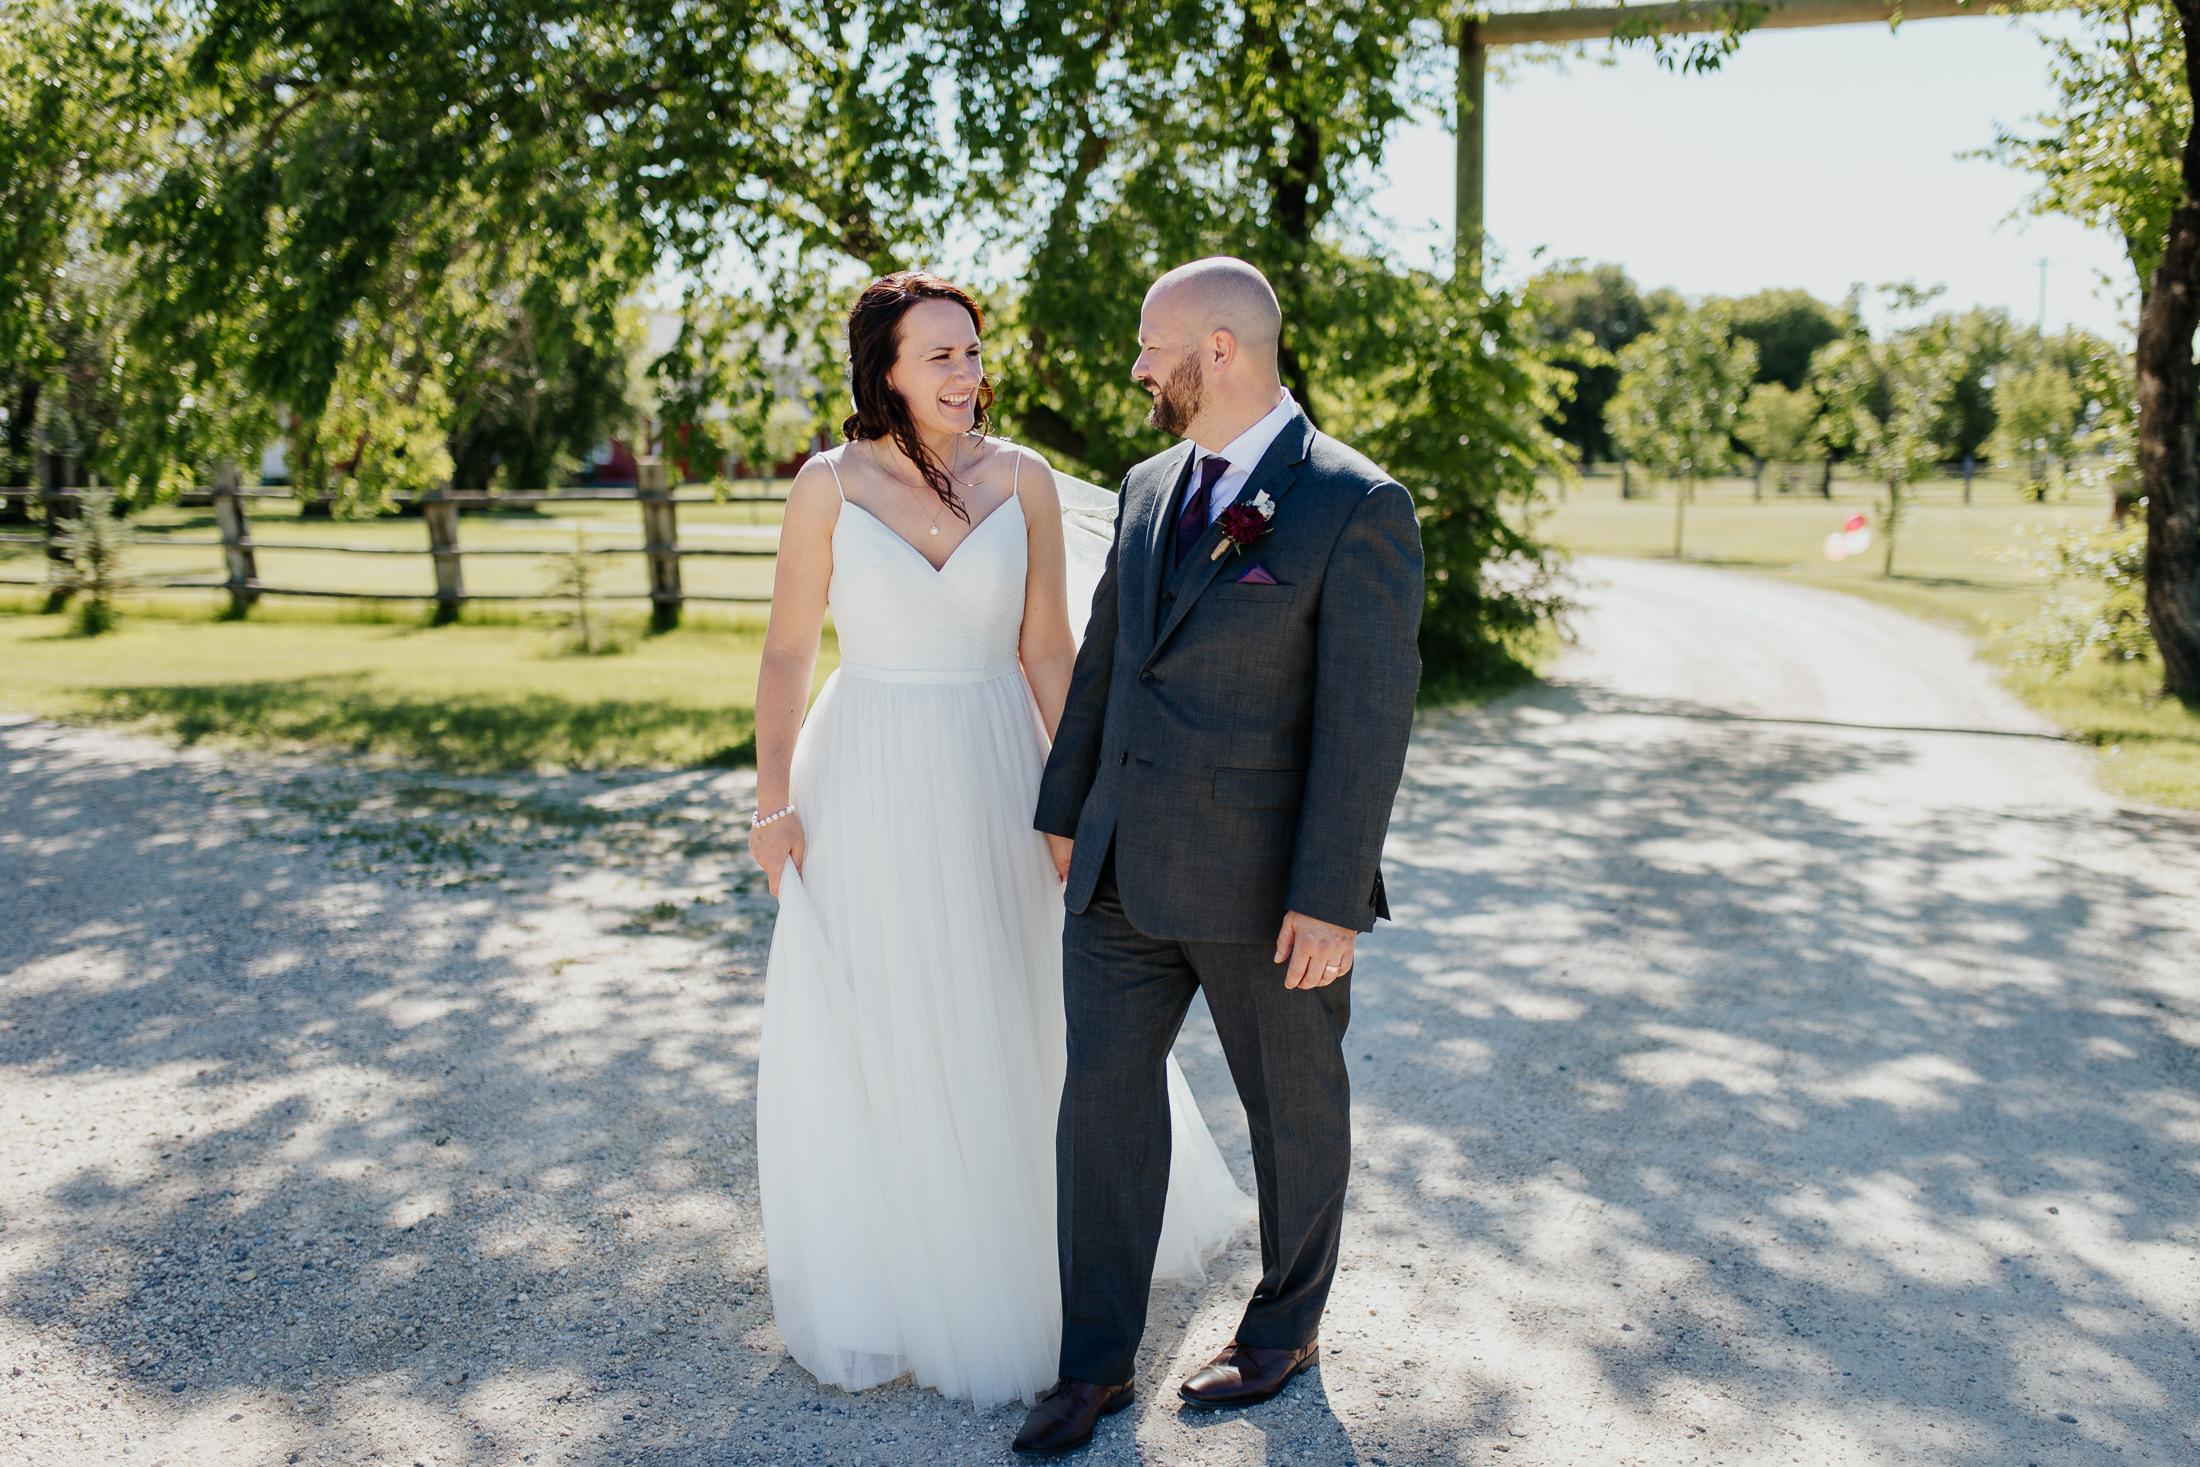 kevin&lori_wedding_029.jpg